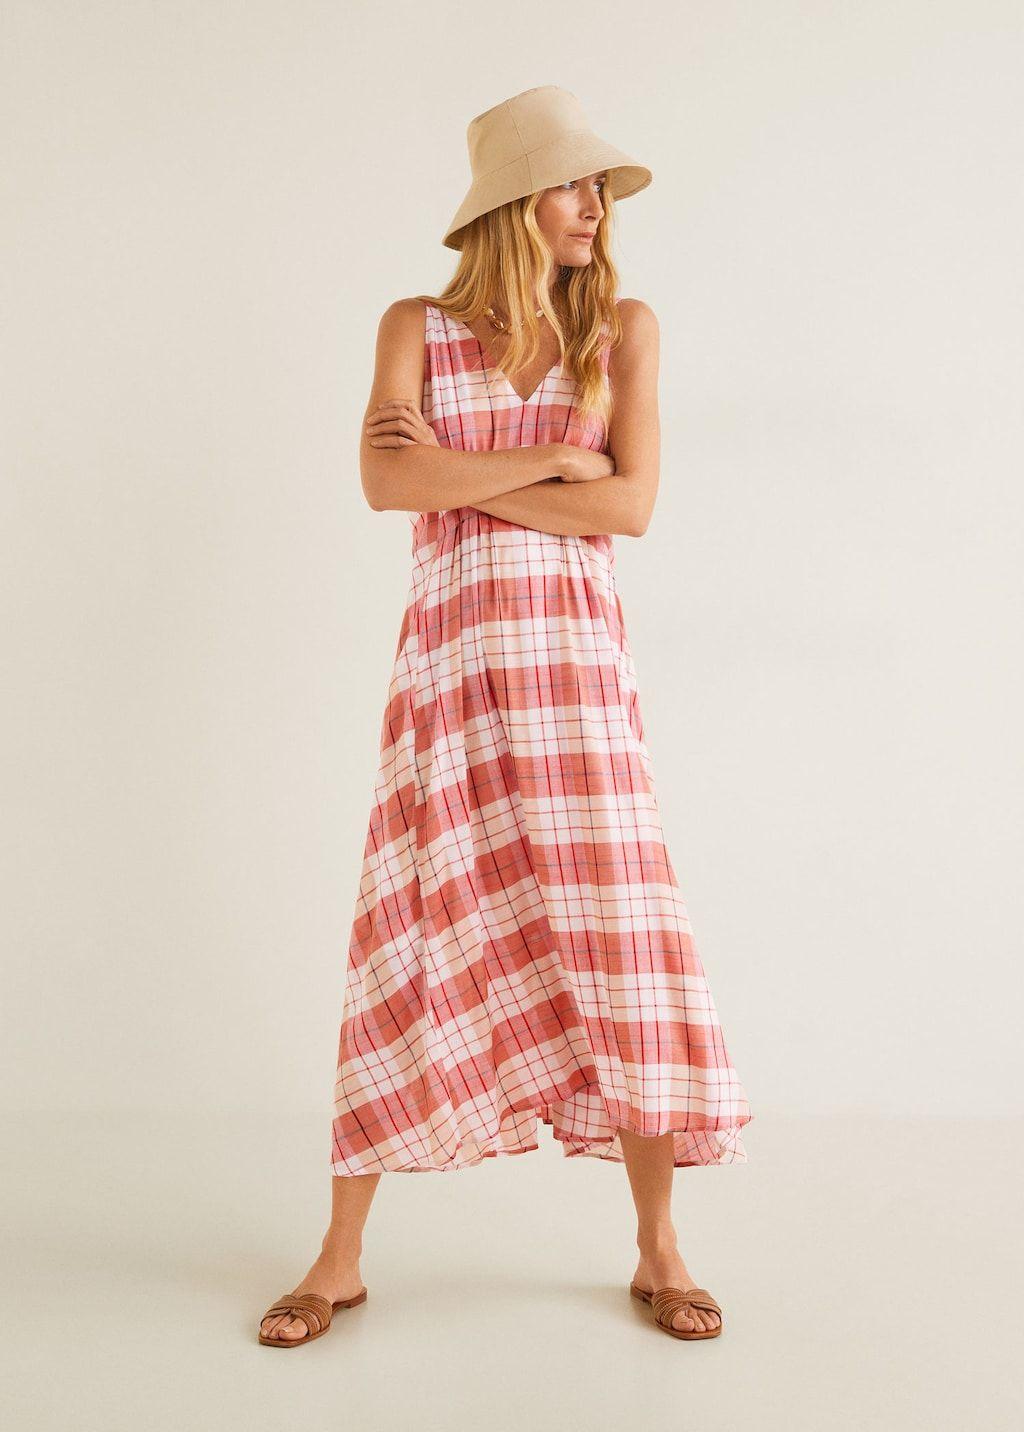 Womens Checked Strappy Mini Dresses Ladies Summer Beach Plaid Sun Dress Skrit